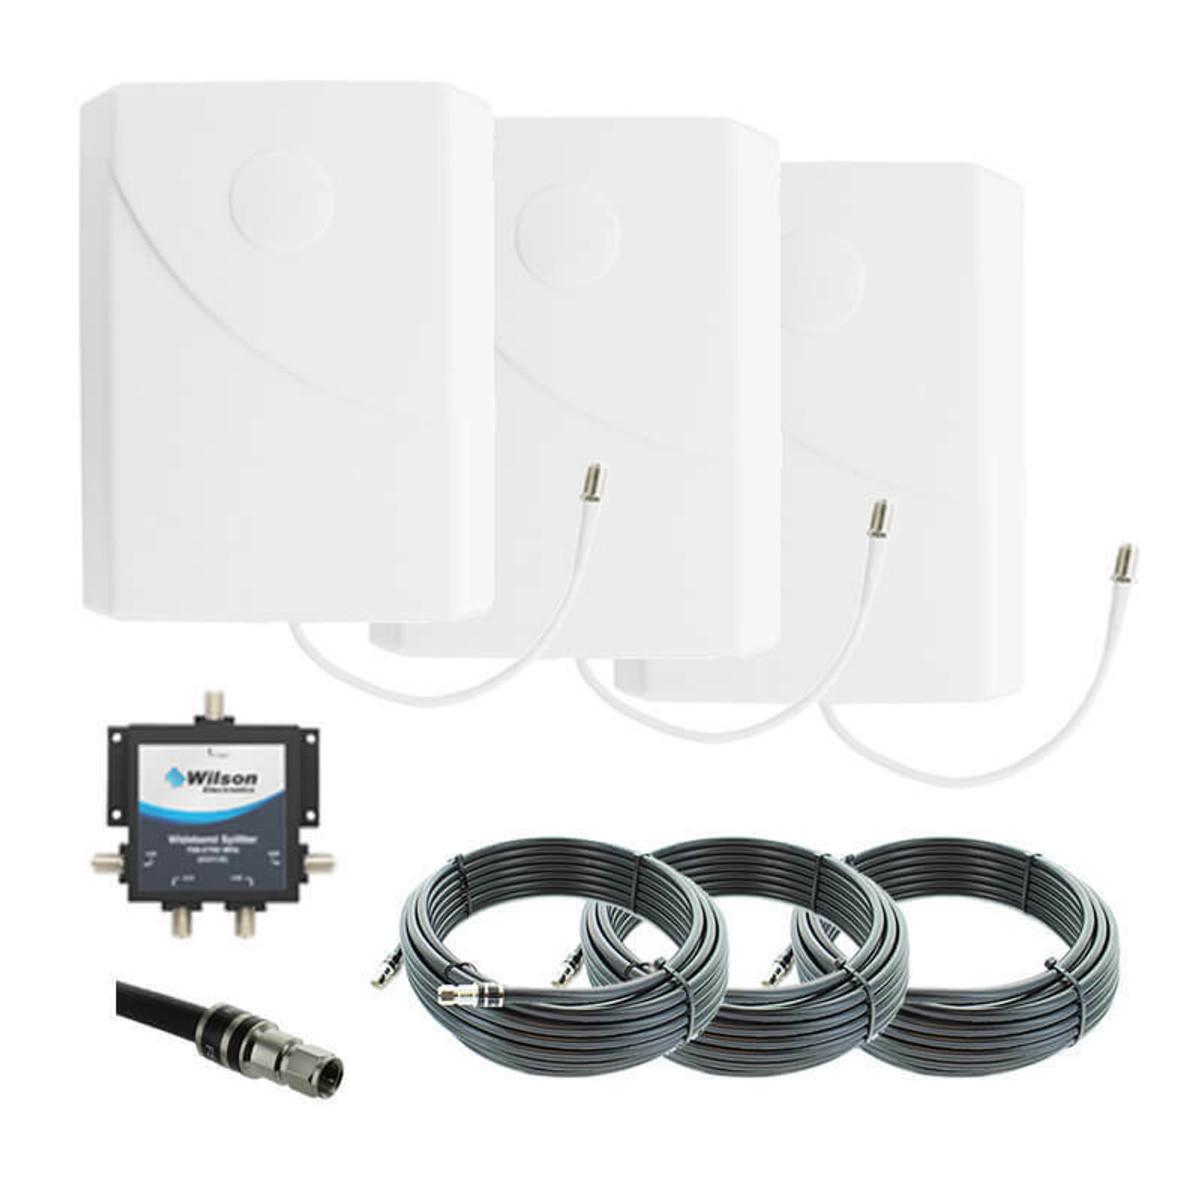 Wilson Triple Antenna Expansion Kit 75 Ohm - 309911-75F